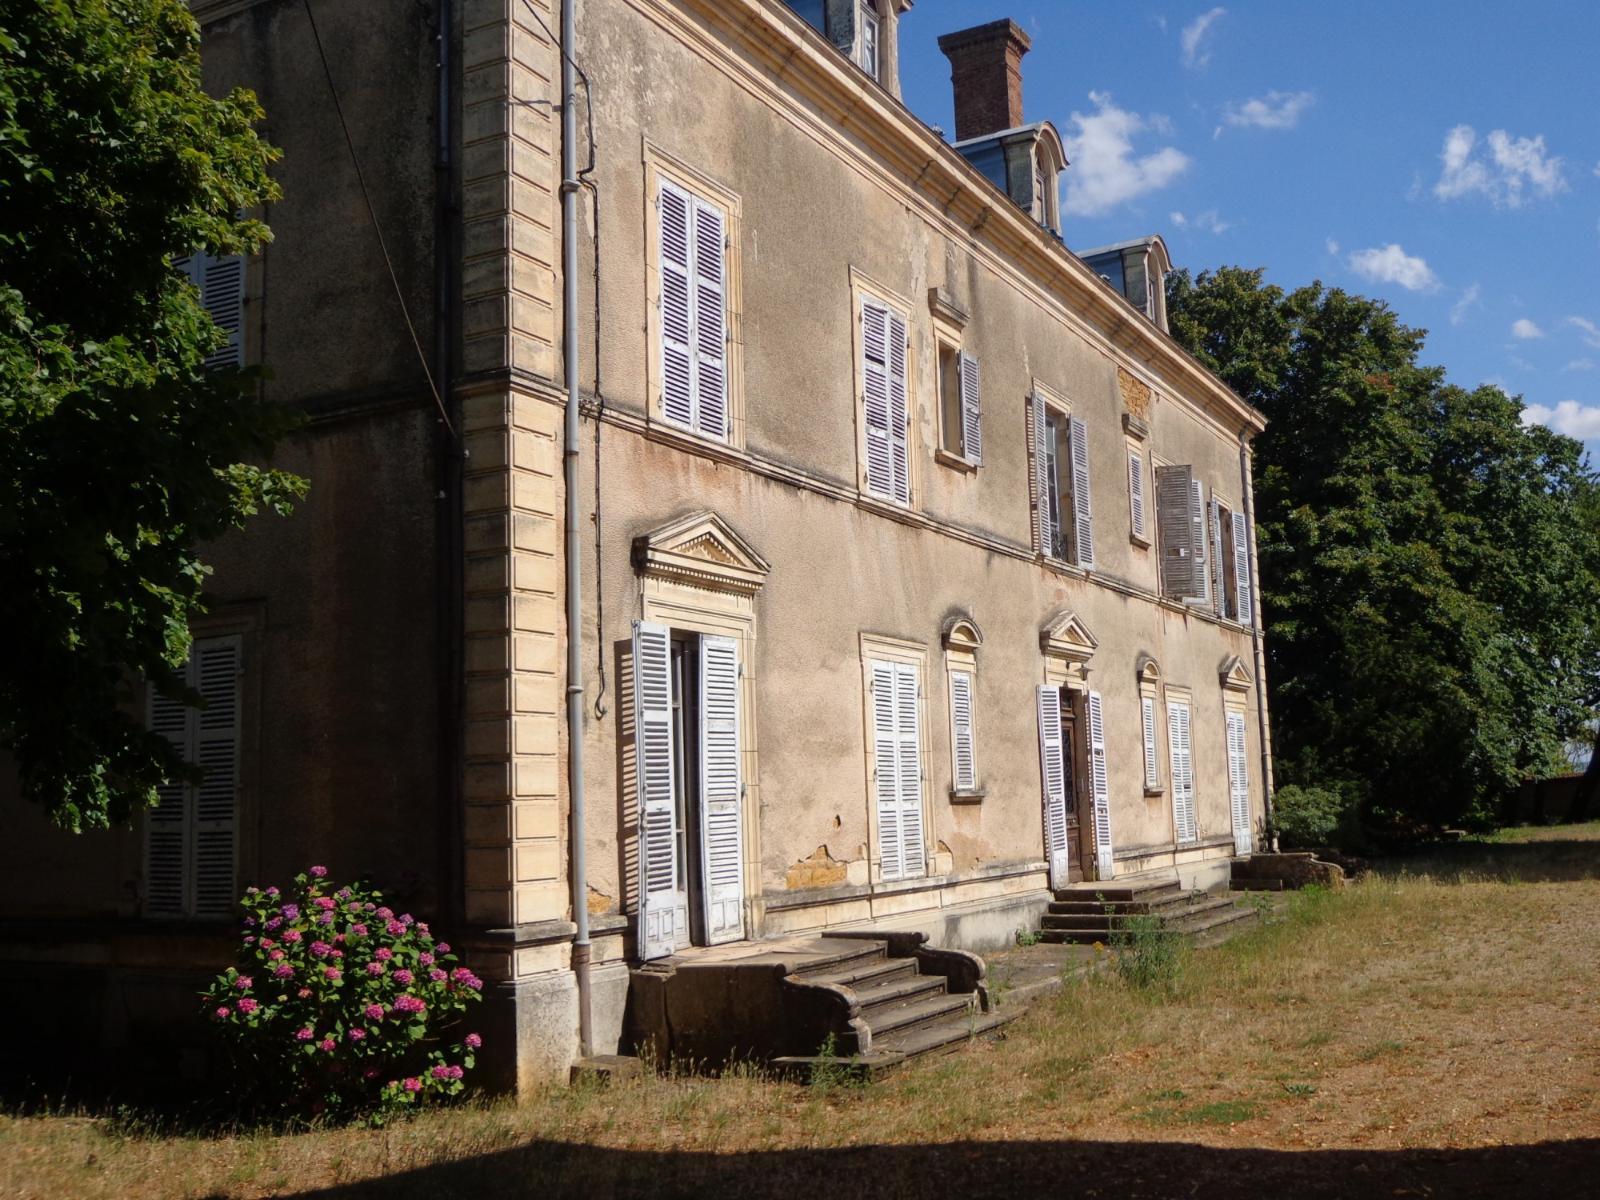 chateau a vendre villefranche sur saone 700 m2 650 000 immobilier jarnioux agence. Black Bedroom Furniture Sets. Home Design Ideas